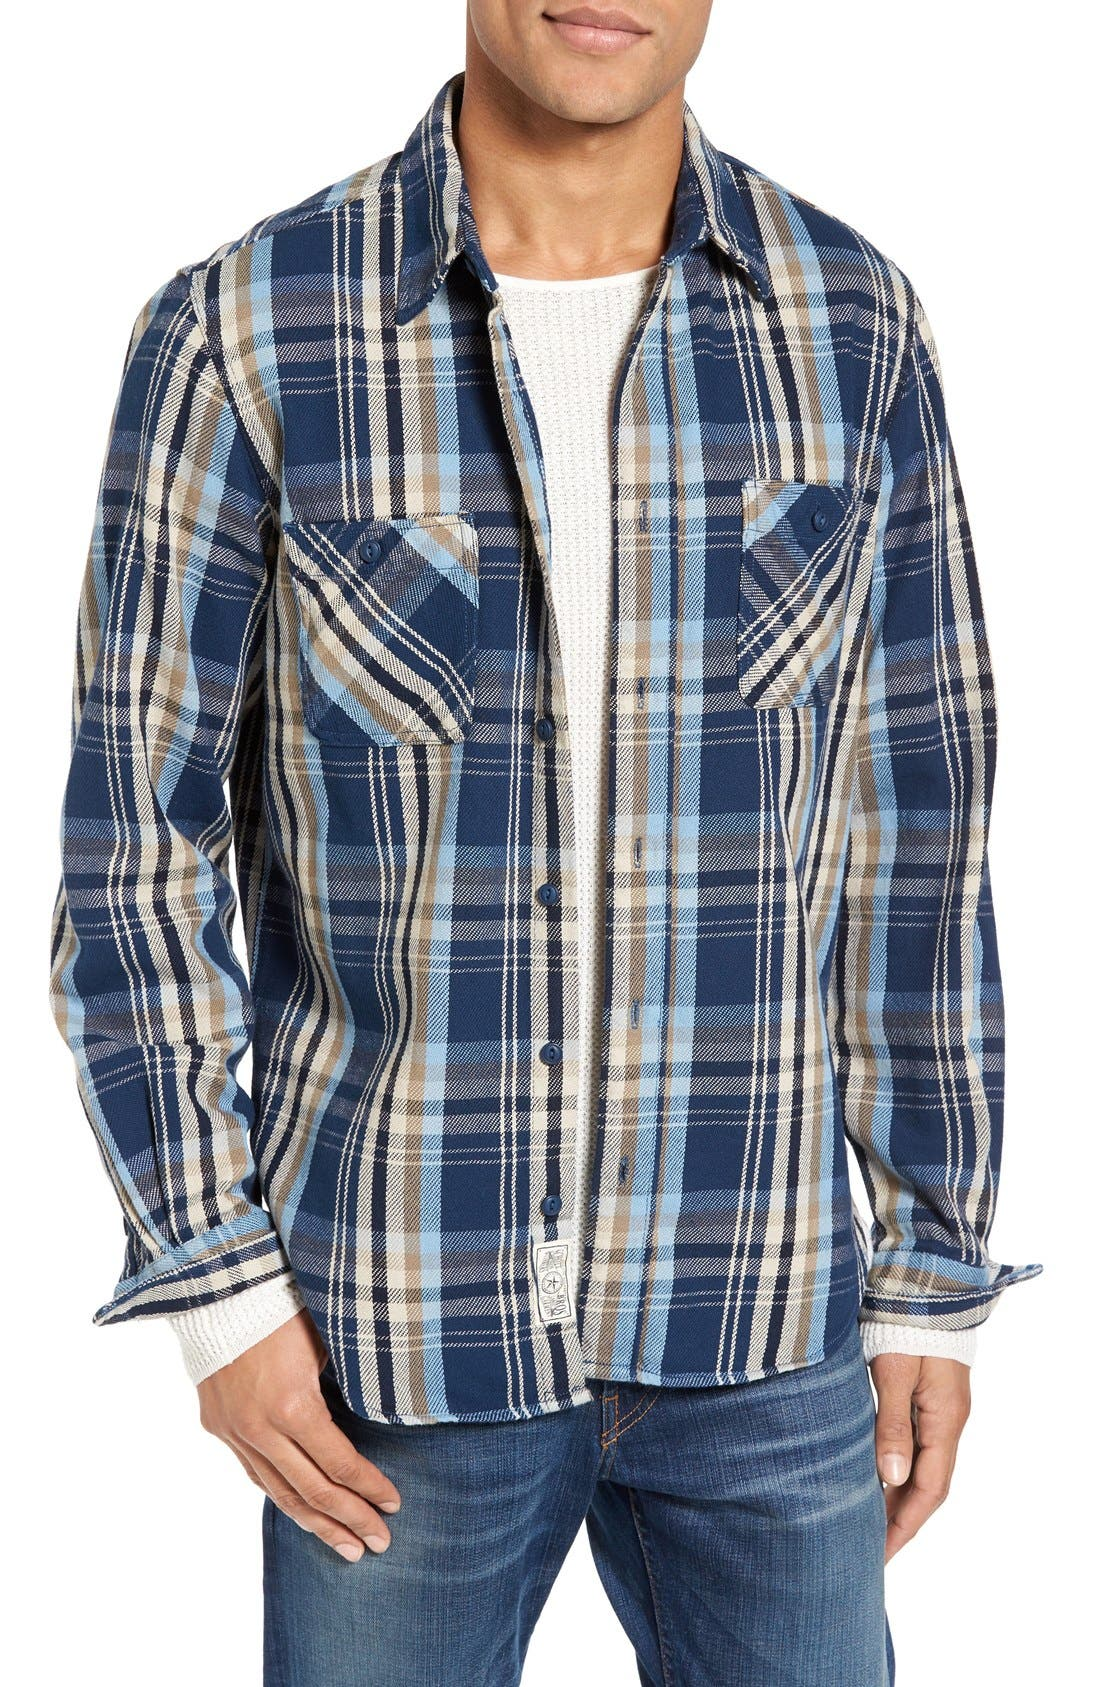 Main Image - Schott NYC Classic Fit Plaid Flannel Shirt